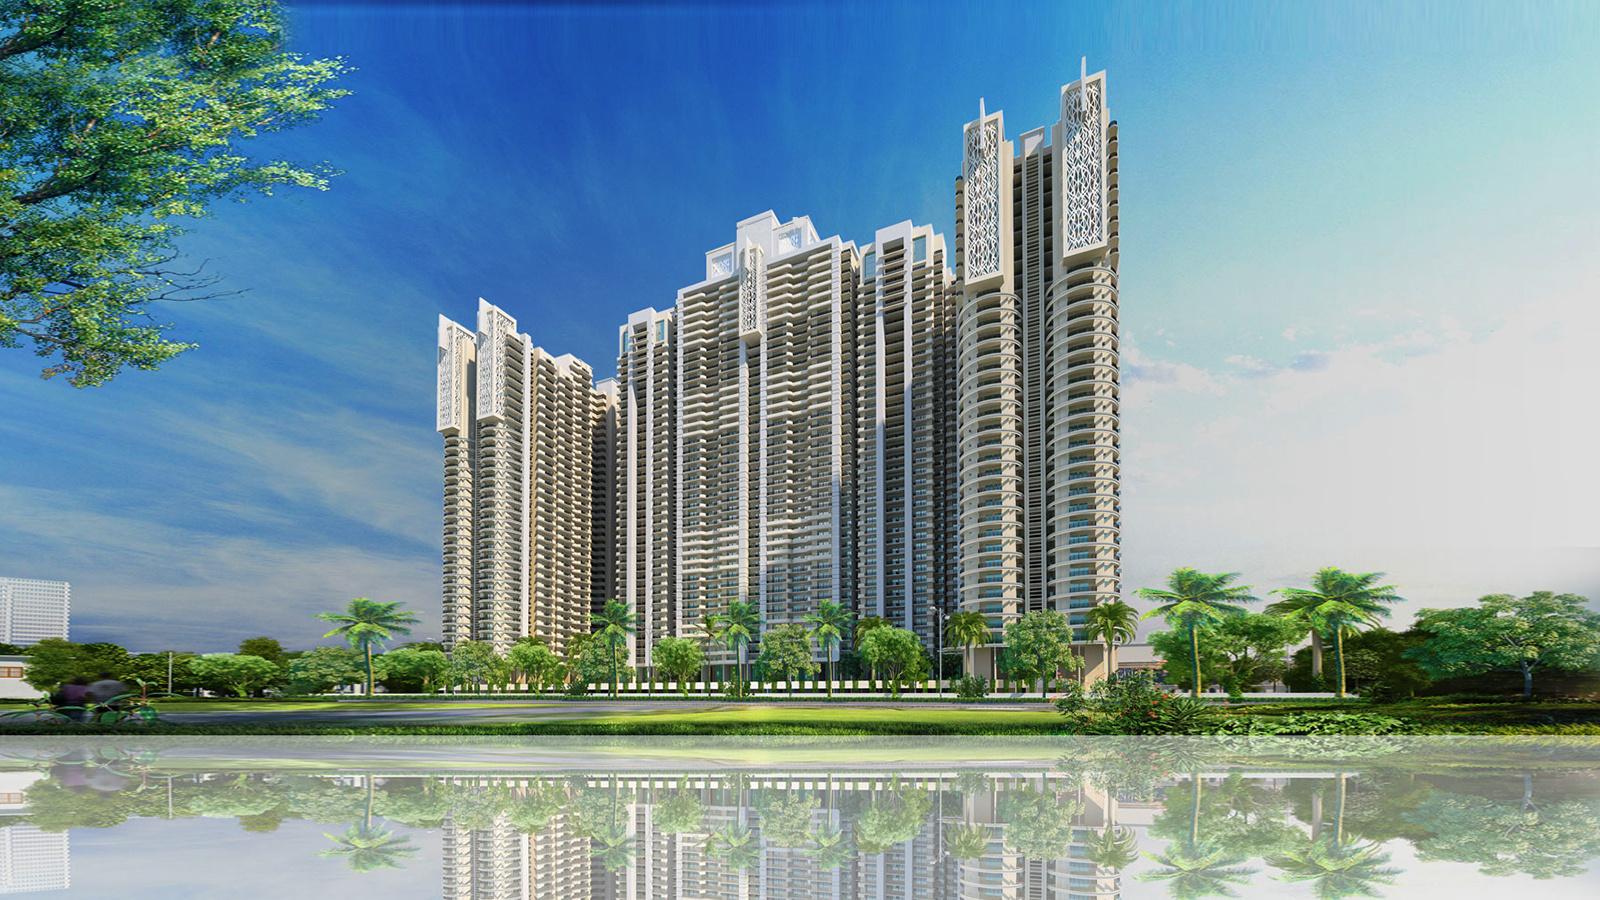 Cloud 9 skylish indirapuram ghaziabad flats in indirapuram price - Under Construction Projects In Indirapuram Under Construction Residential Projects For Sale In Indirapuram Ghaziabad